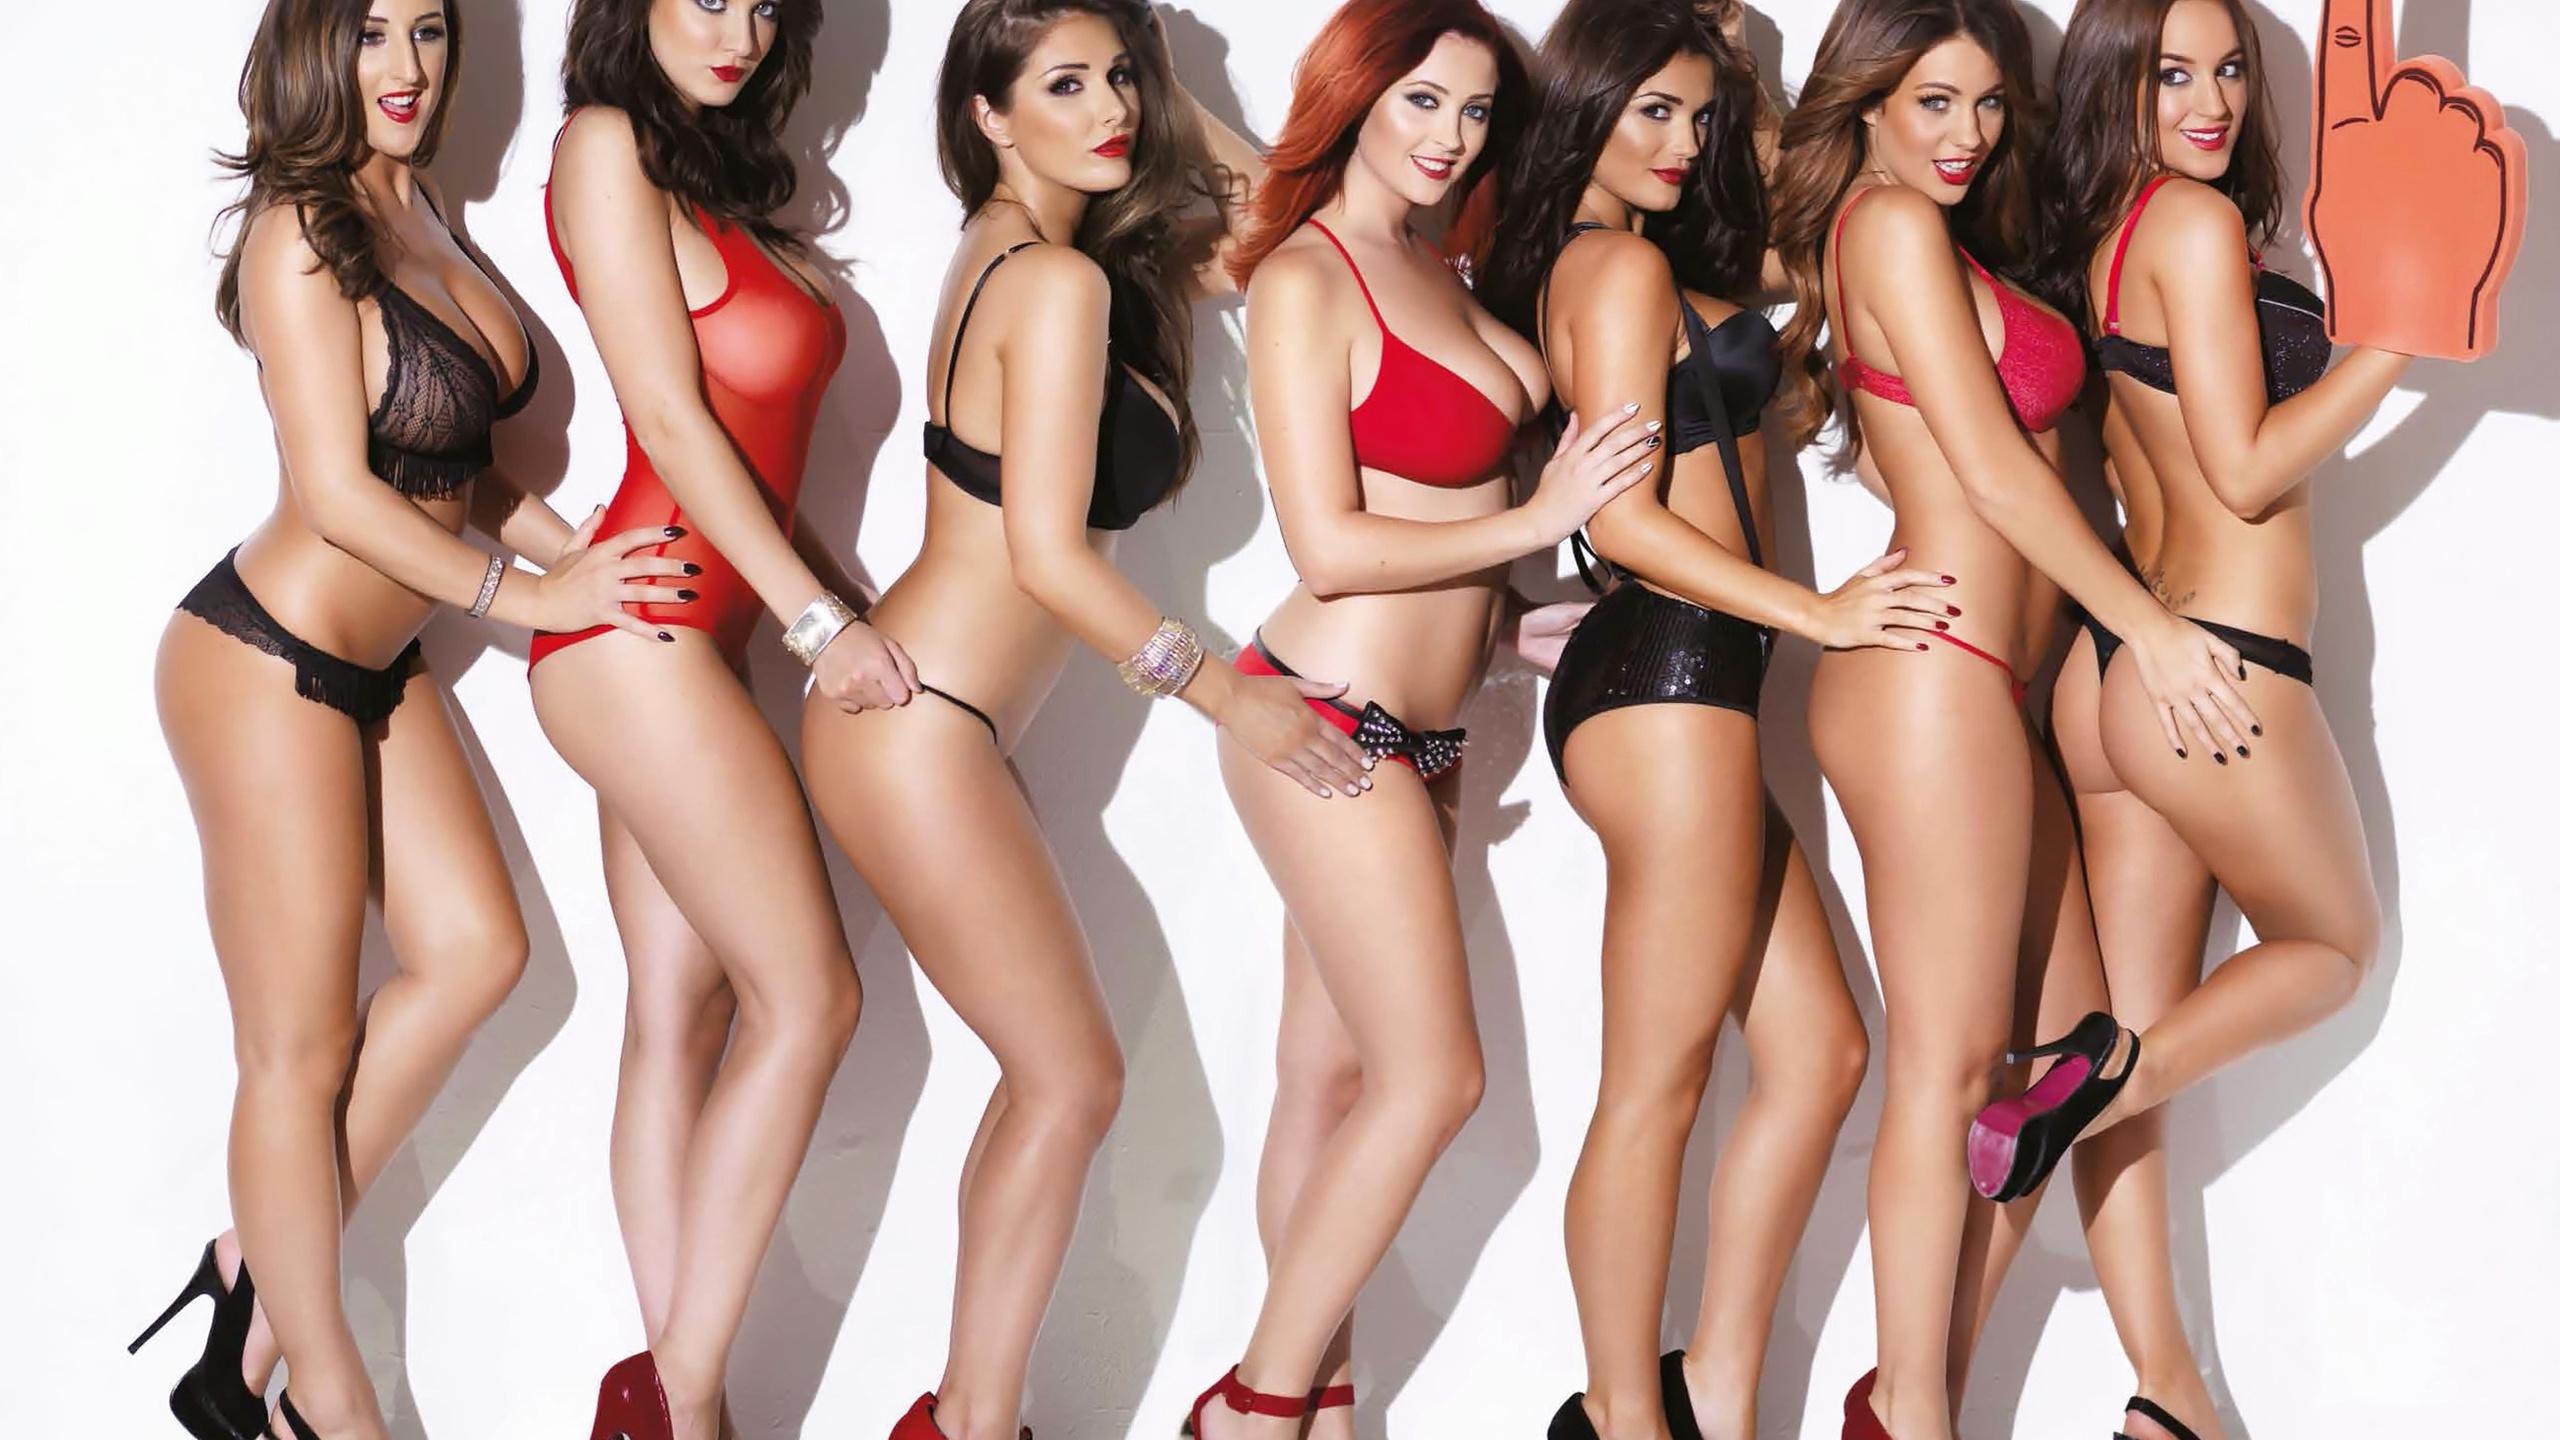 lucy pinder, friends, lingerie, sexy, model, heels, foam finger, , hotties, cute, ladies, , hair, , beautys, stacey poole, holly peers, rosie jones, ucy collett, joey fisher, lucy collett, http://www.nastol.com.ua/ero/109215-holly-peers-india-reynolds-joe